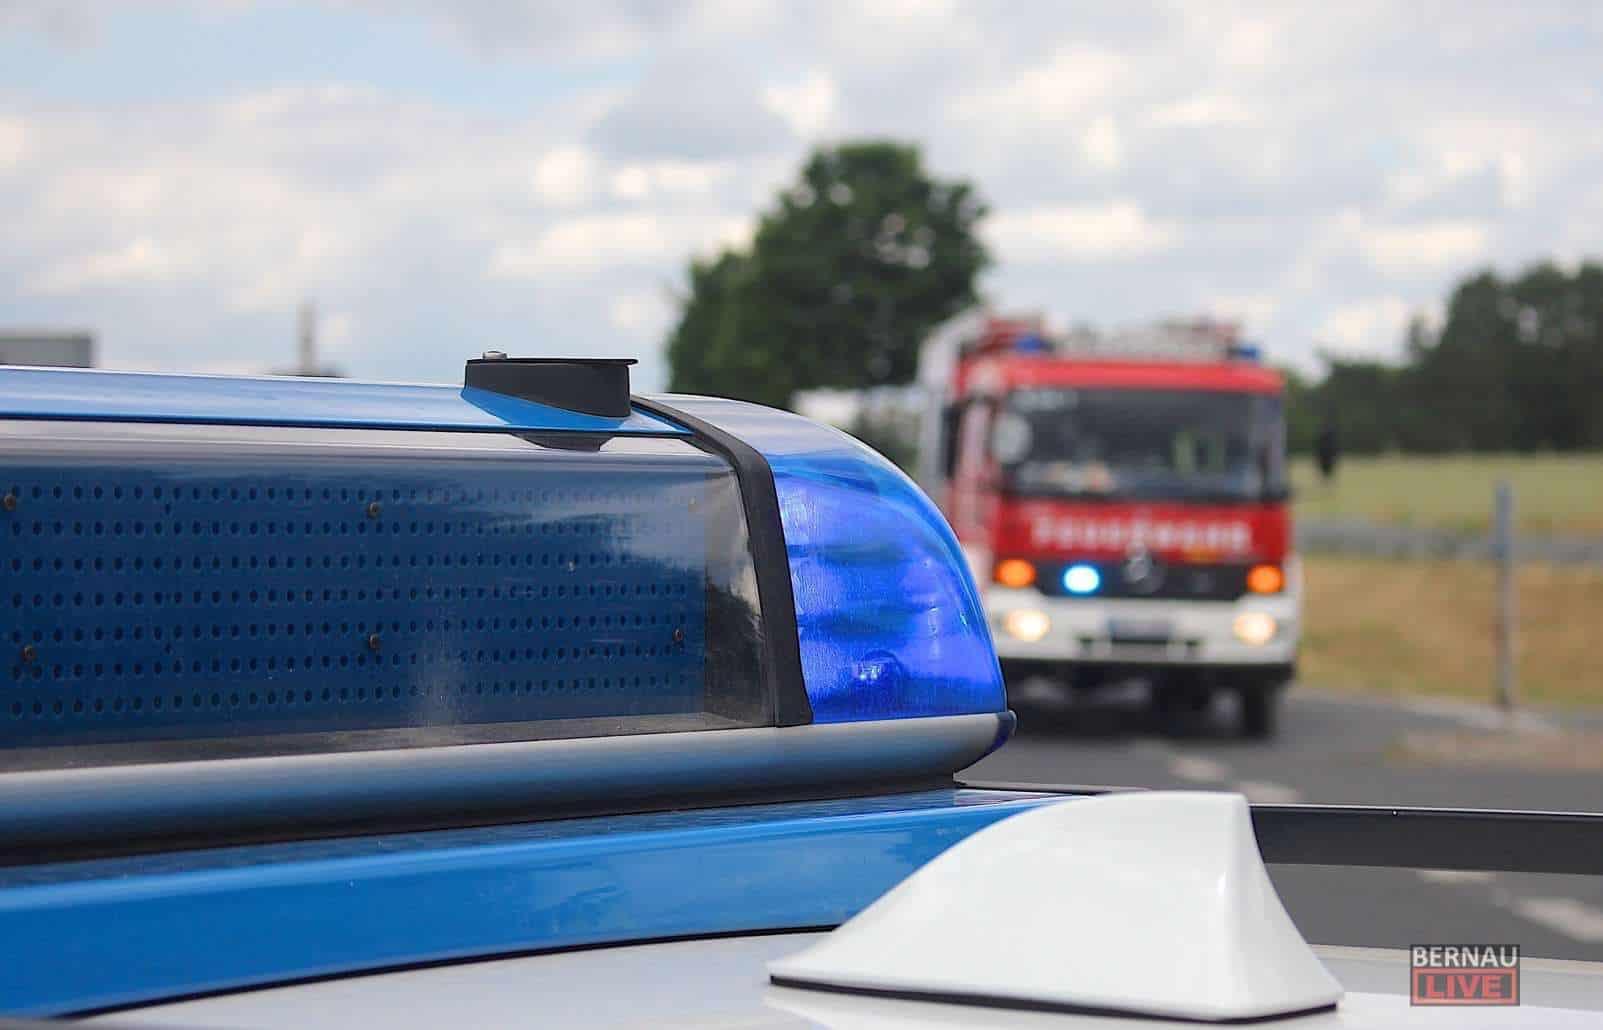 Verkehrshinweis: Schwerer Unfall A11 zw. Lanke und Finowfurt